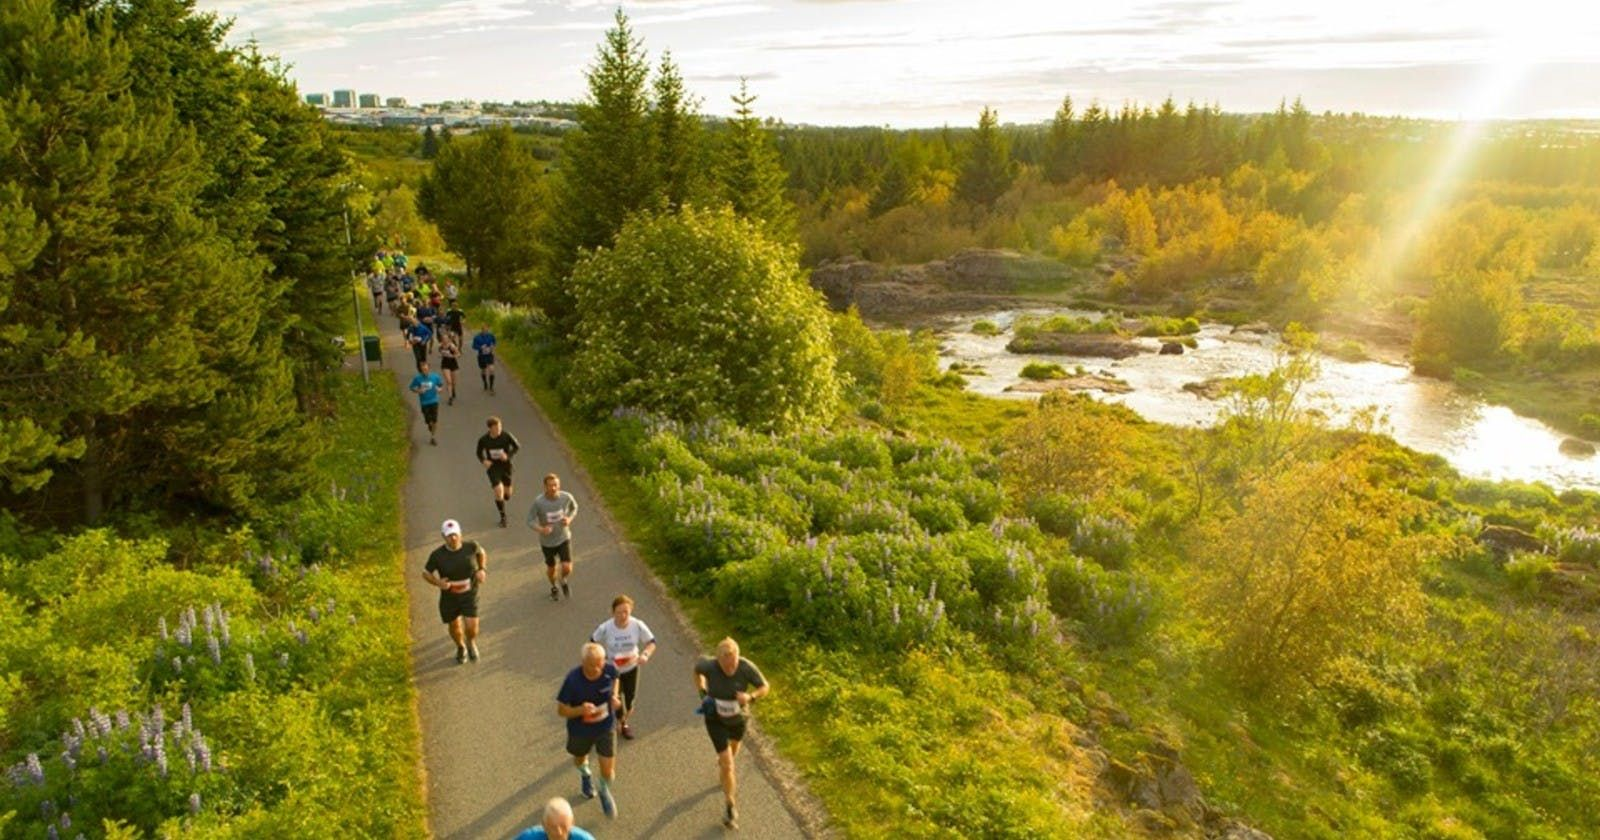 Runners in the midnight run